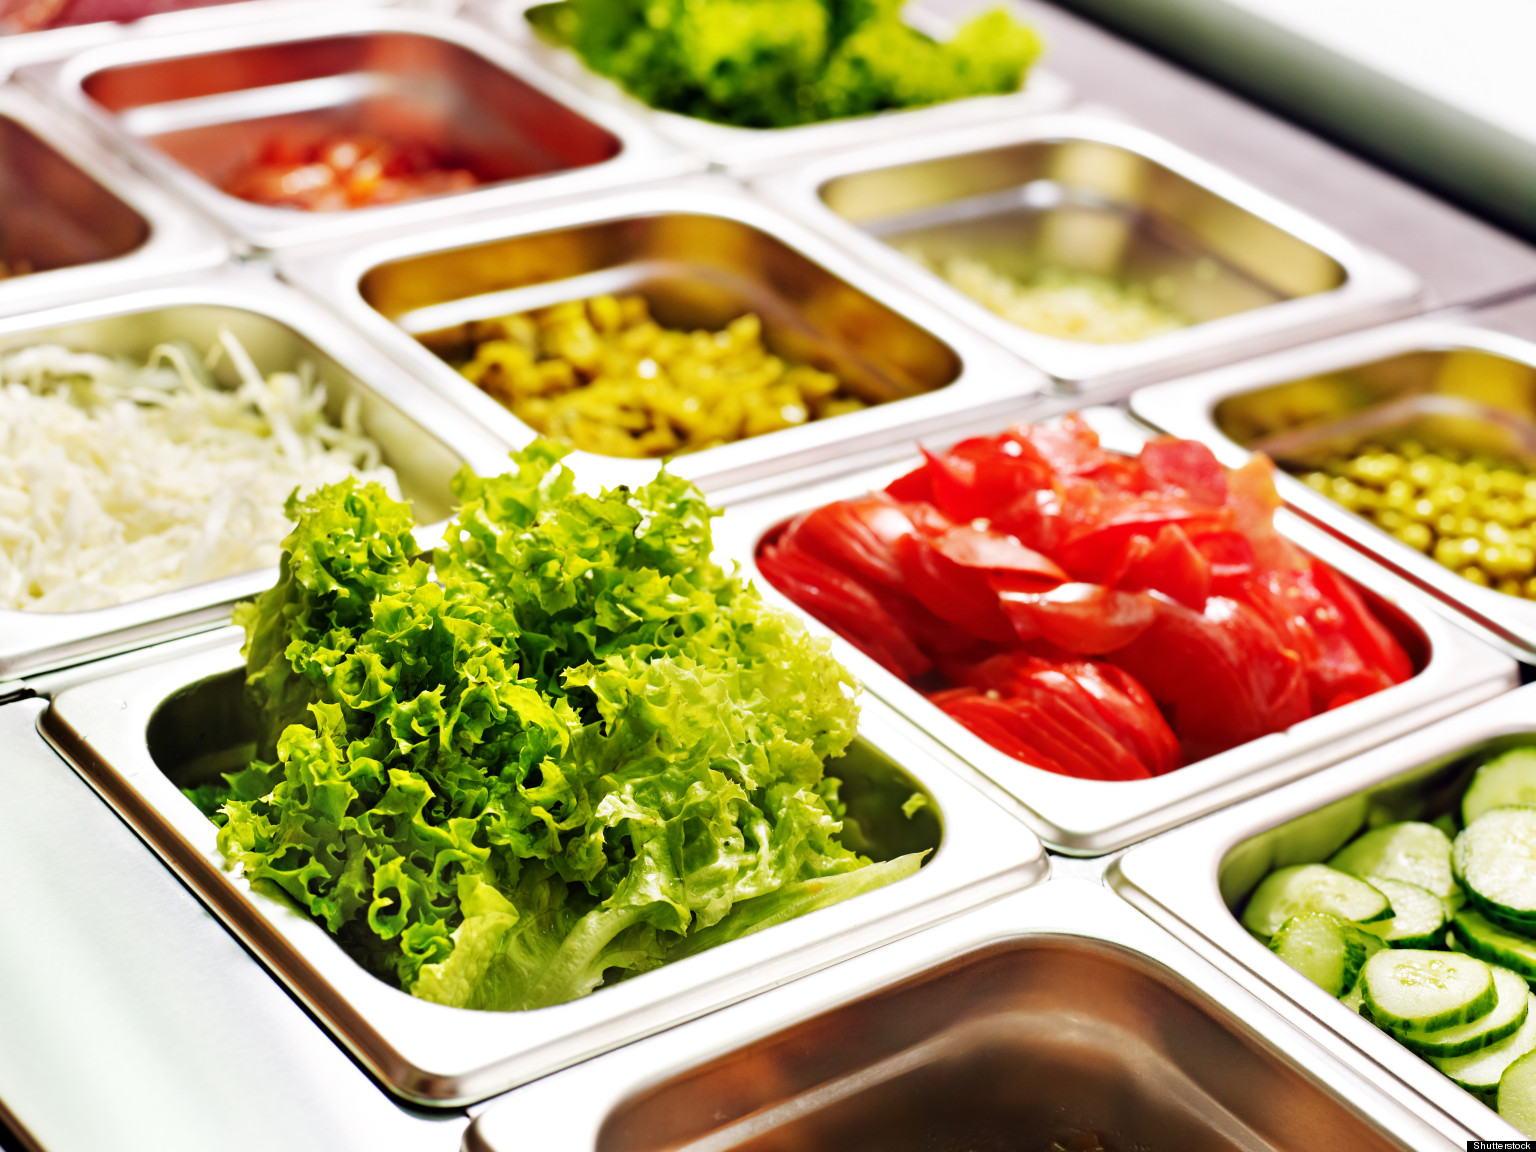 Bringing Healthy School Foods to NYC Public Schools | HuffPost